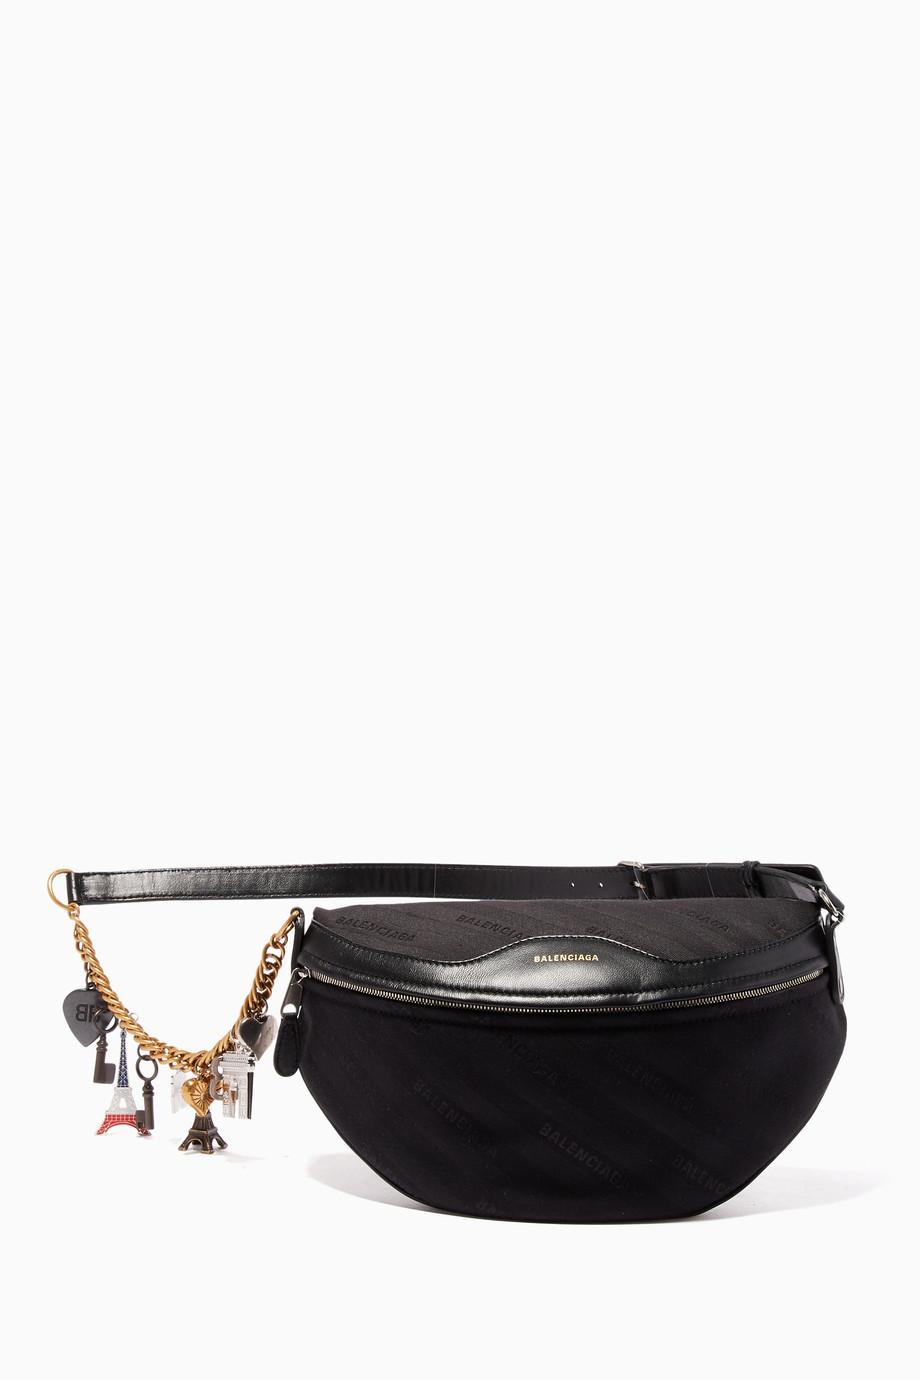 0ad5670631fd Shop Balenciaga Black Black Canvas Souvenir Belt Bag for Women ...